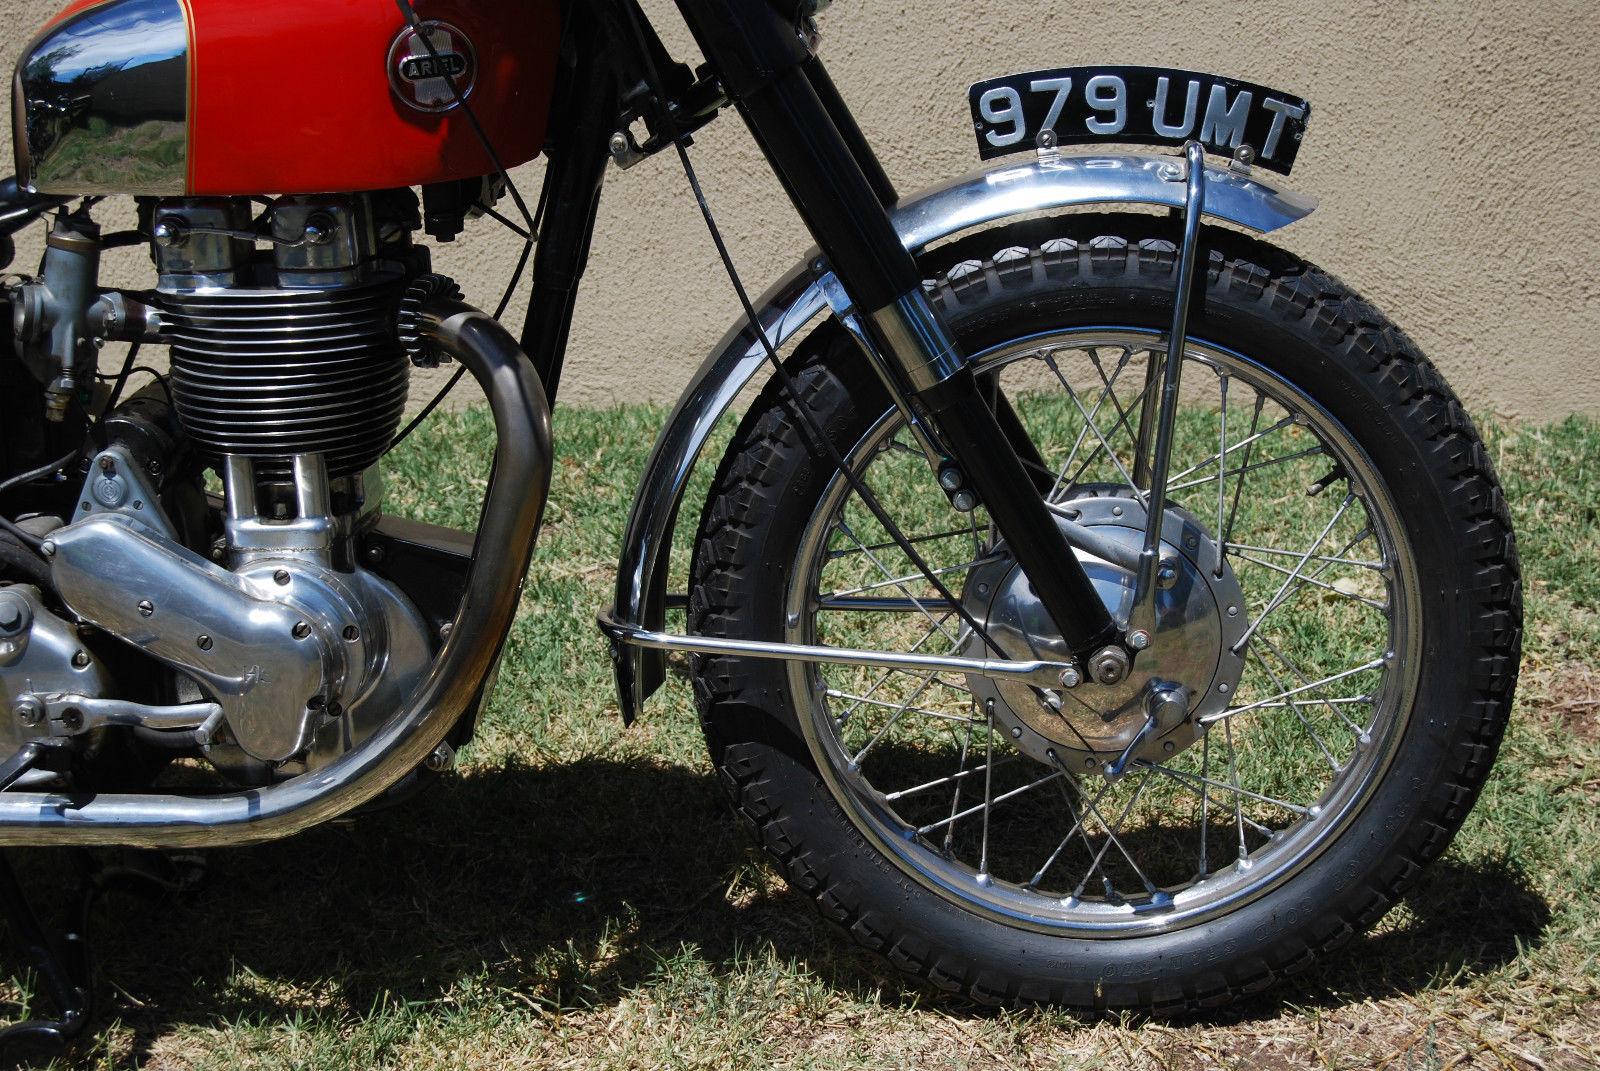 Ariel HS - 1957 - Front Wheel, Front Forks, Fender, Number Plate and Brake Plate.